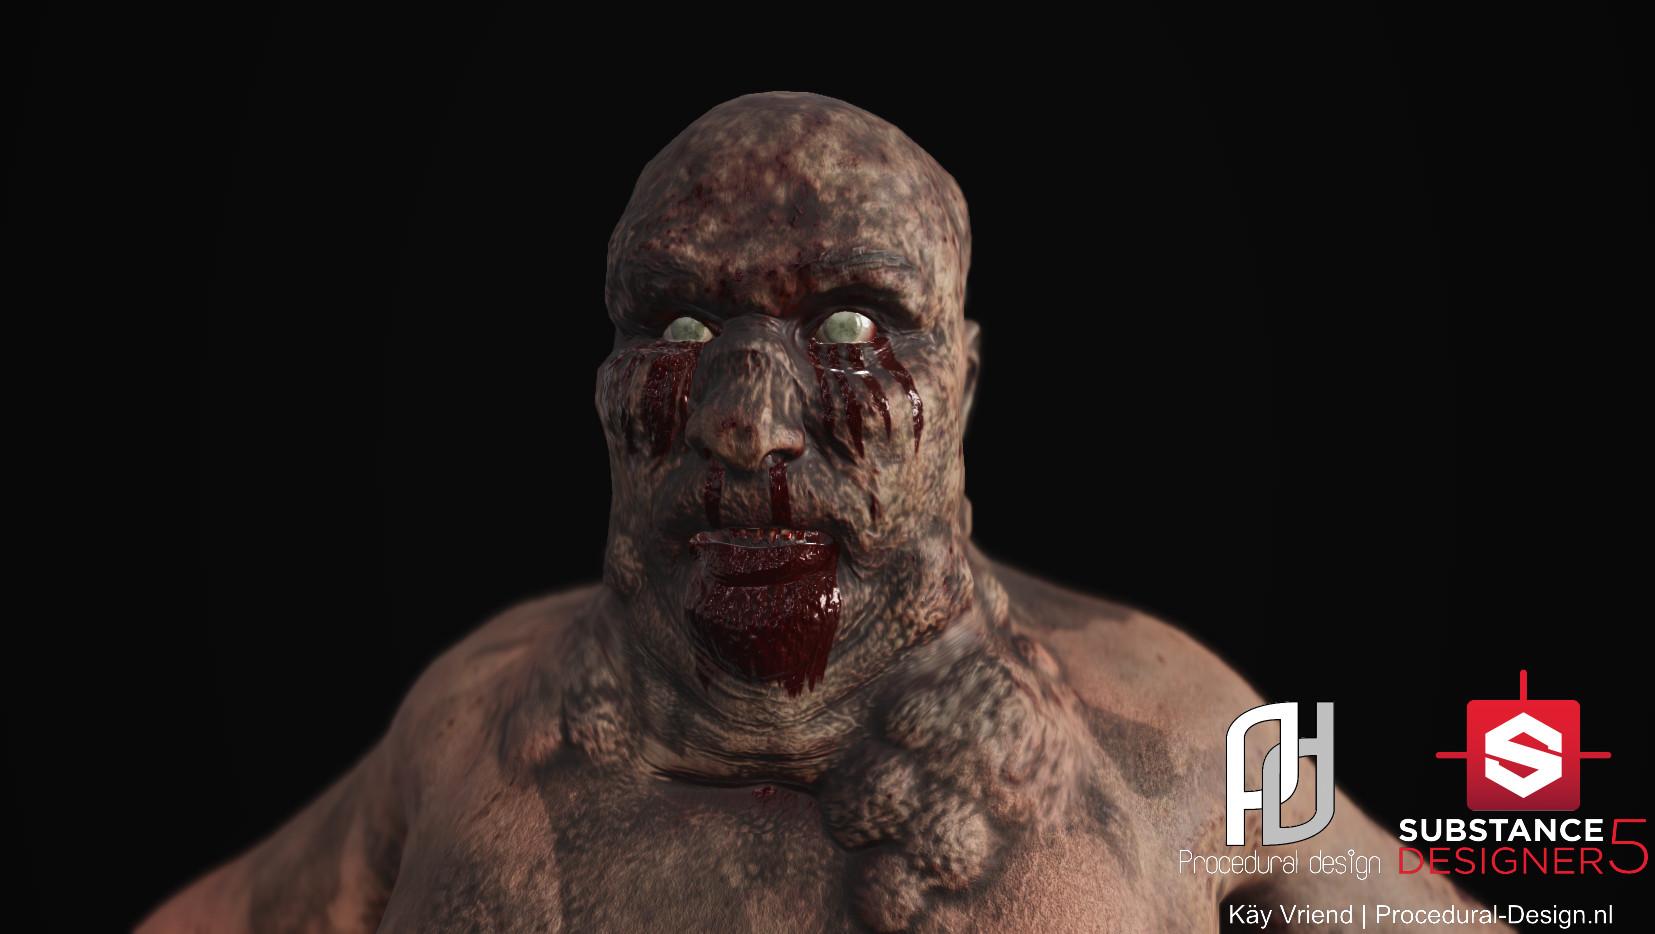 Kay vriend zombie 9